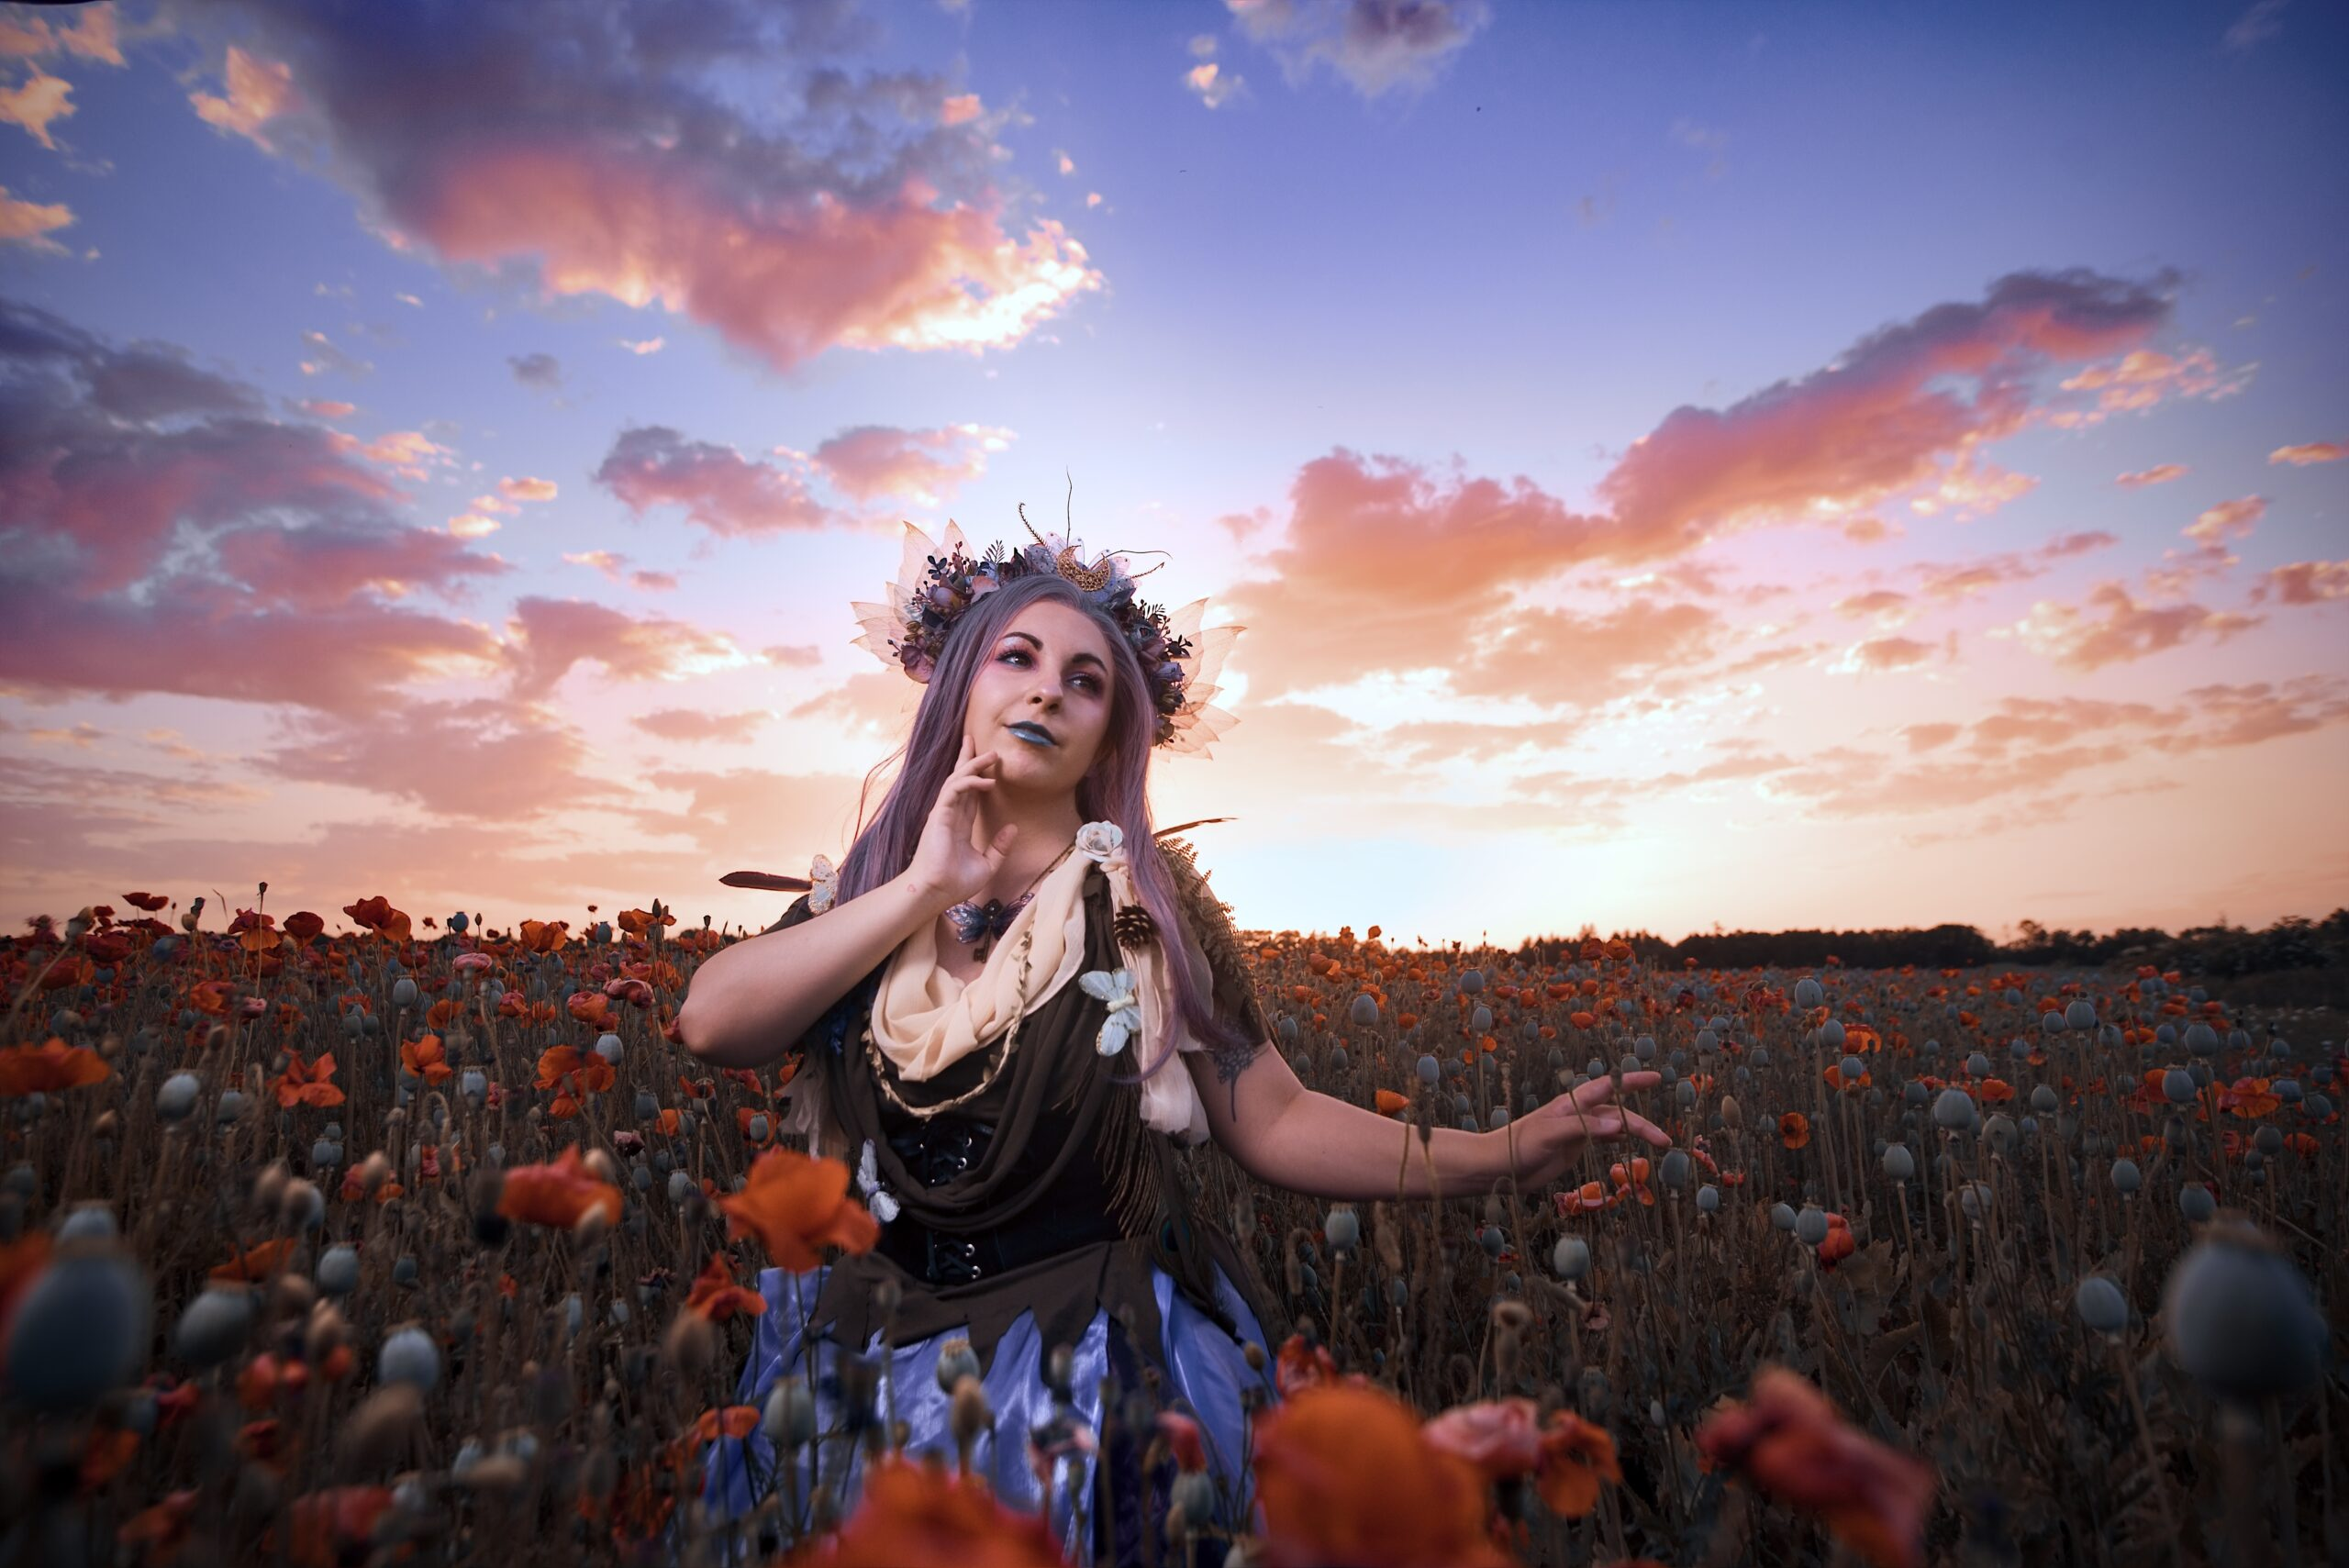 Editing Portraits Against a Bright Sky